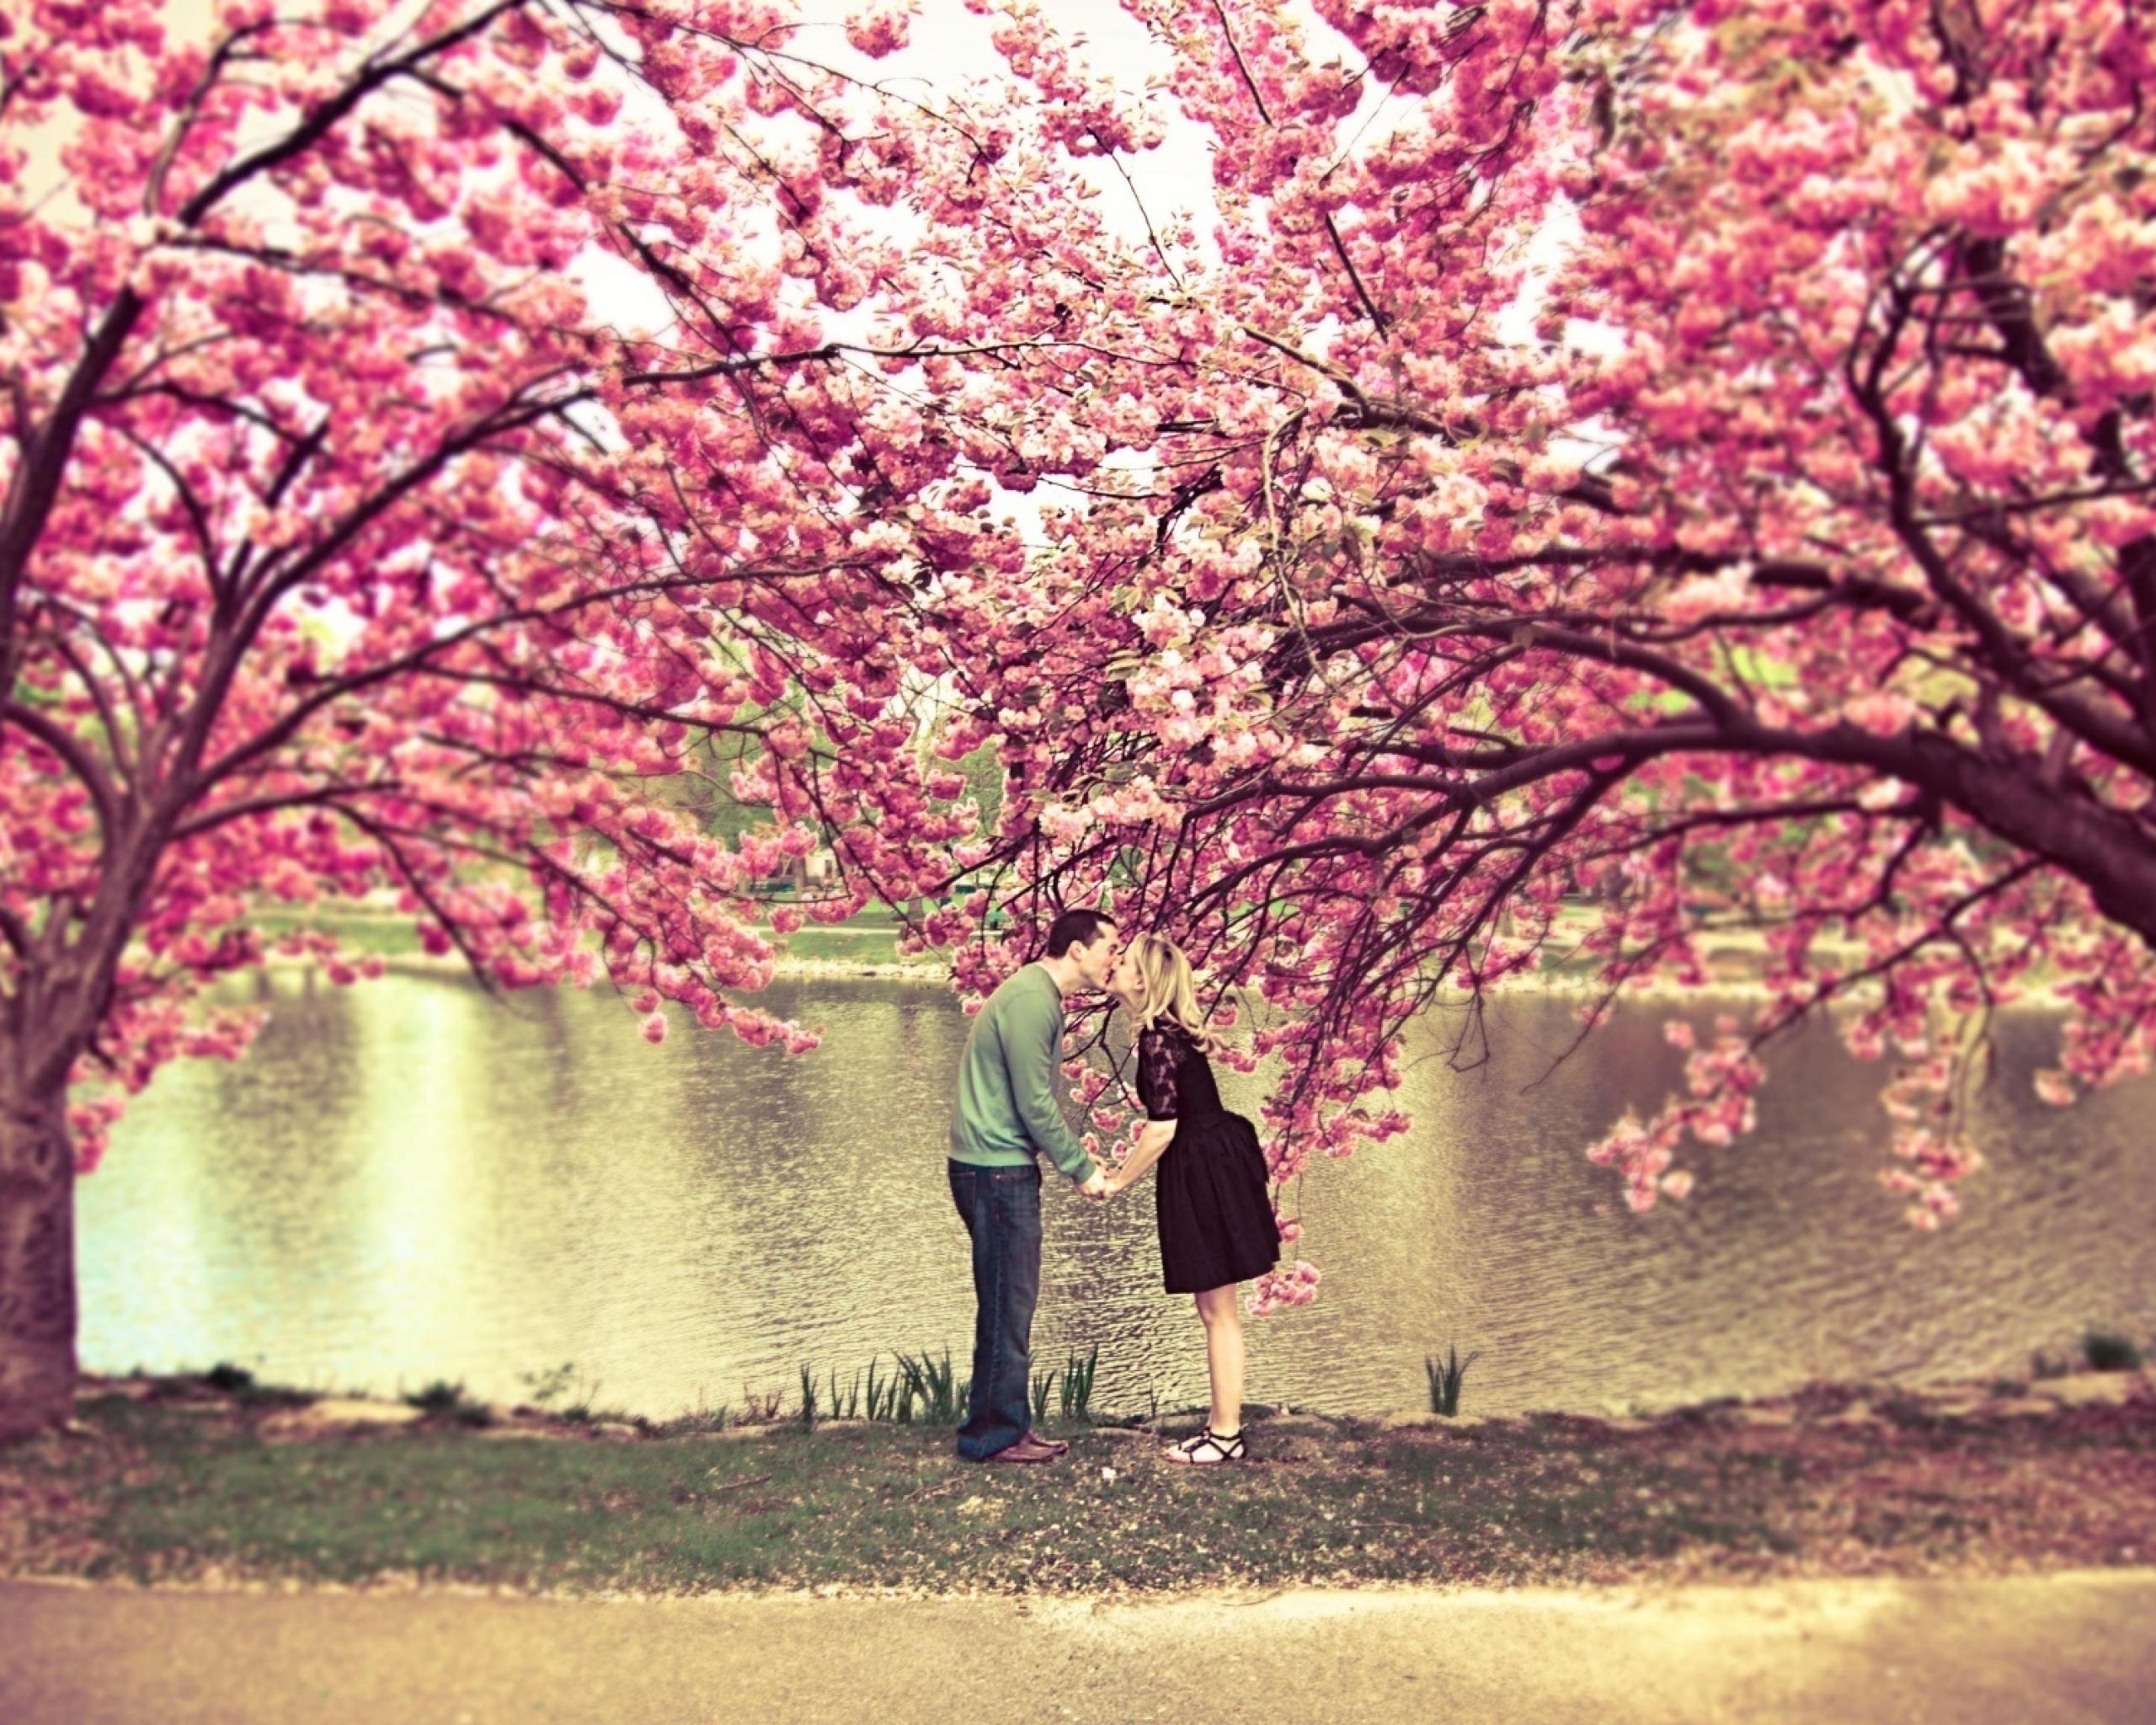 Res: 2560x2048, ... Romantic-Couple-Love-HD-Wallpaper